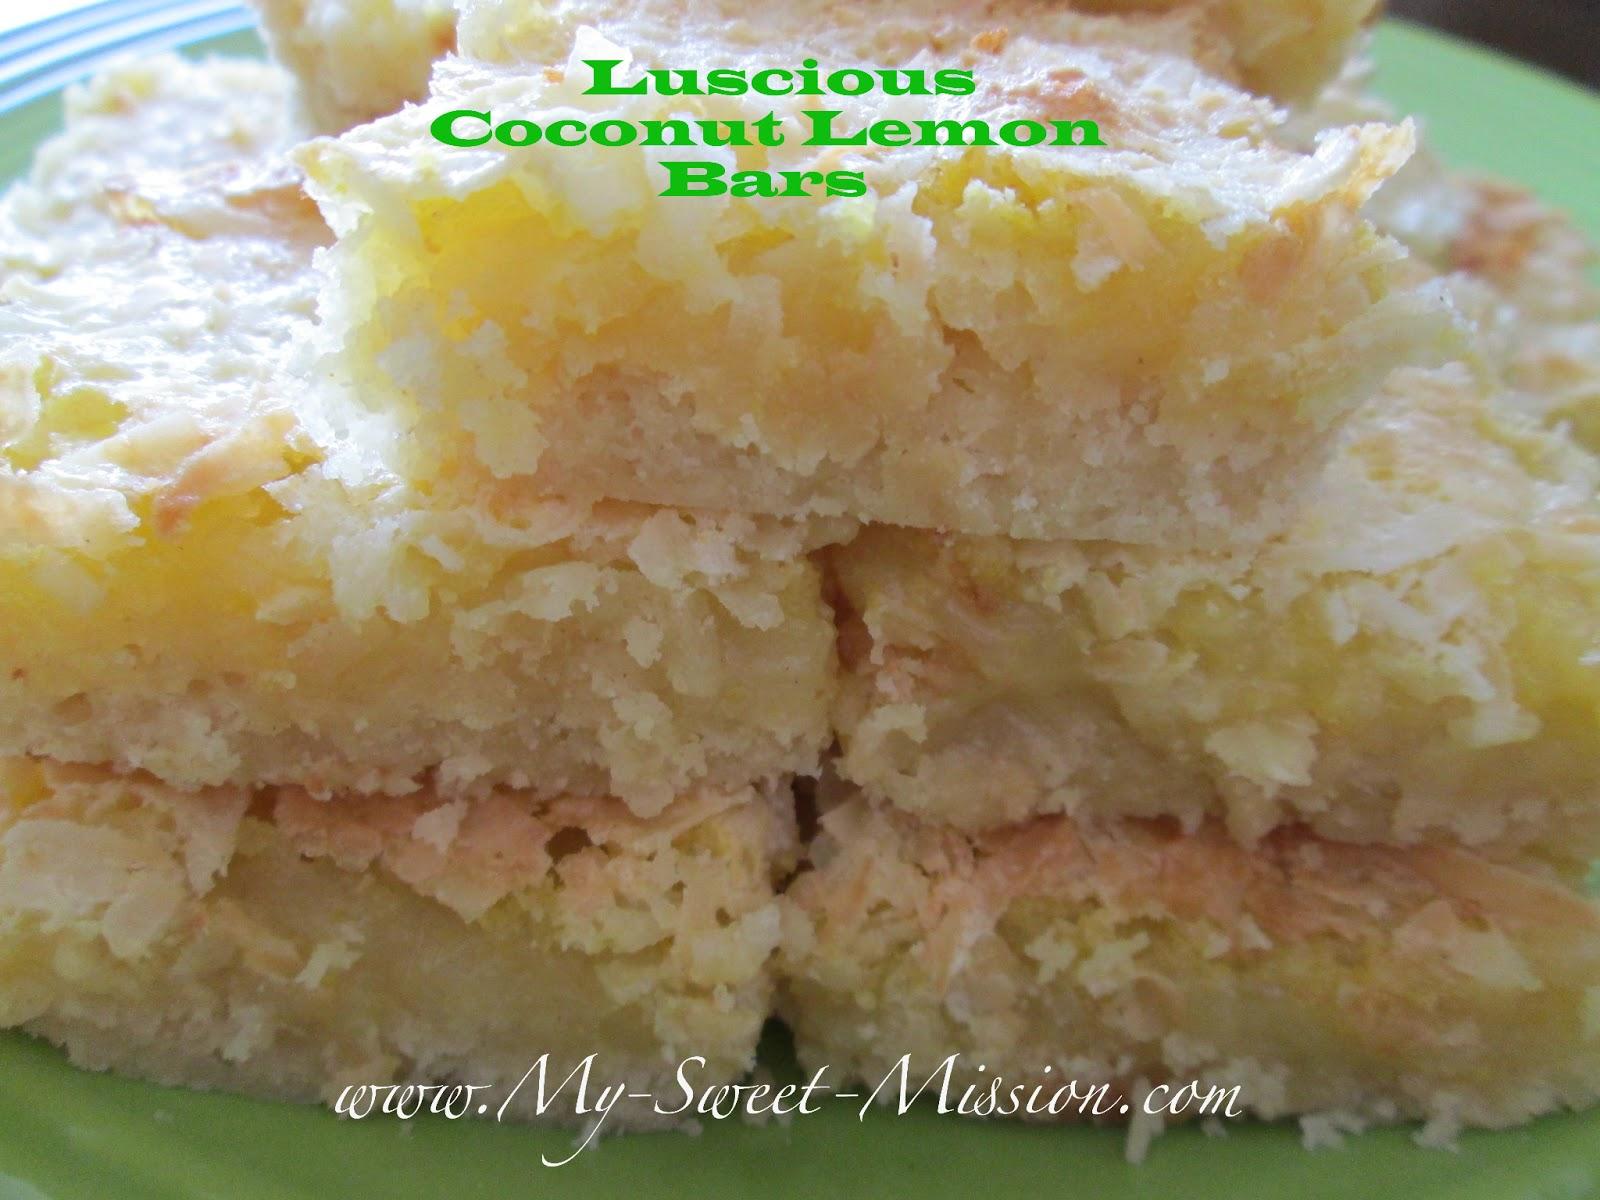 Luscious Coconut Lemon Bars